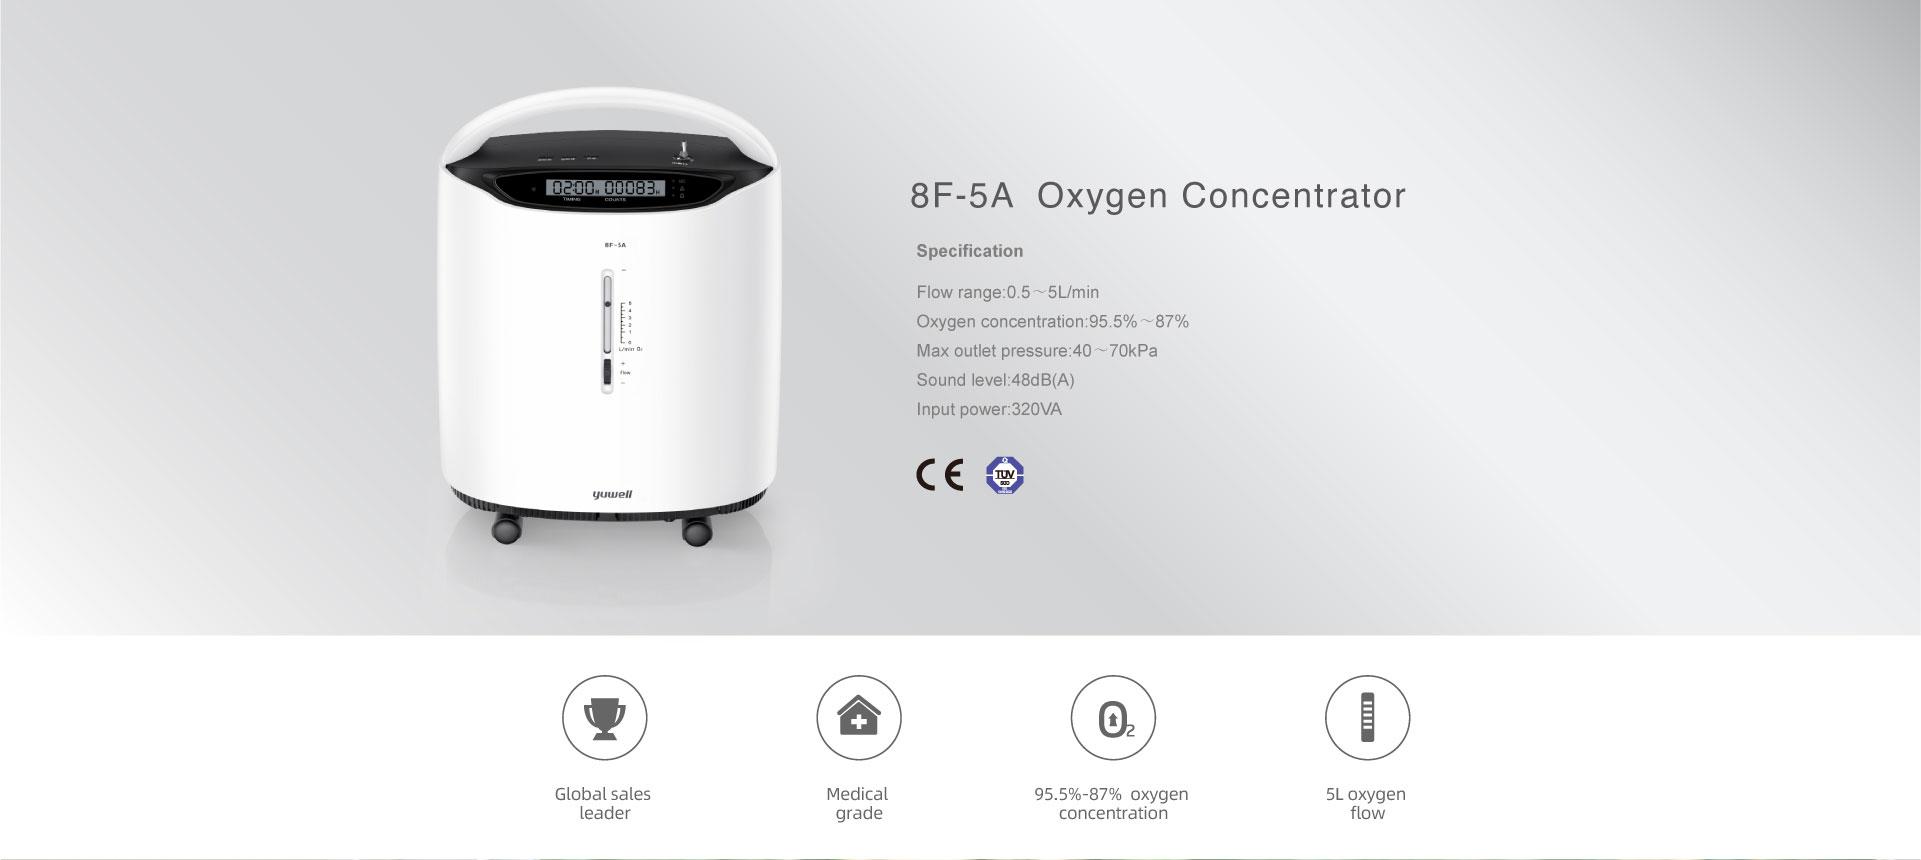 8F-5A Oxygen Concentrator - Zan-Tech